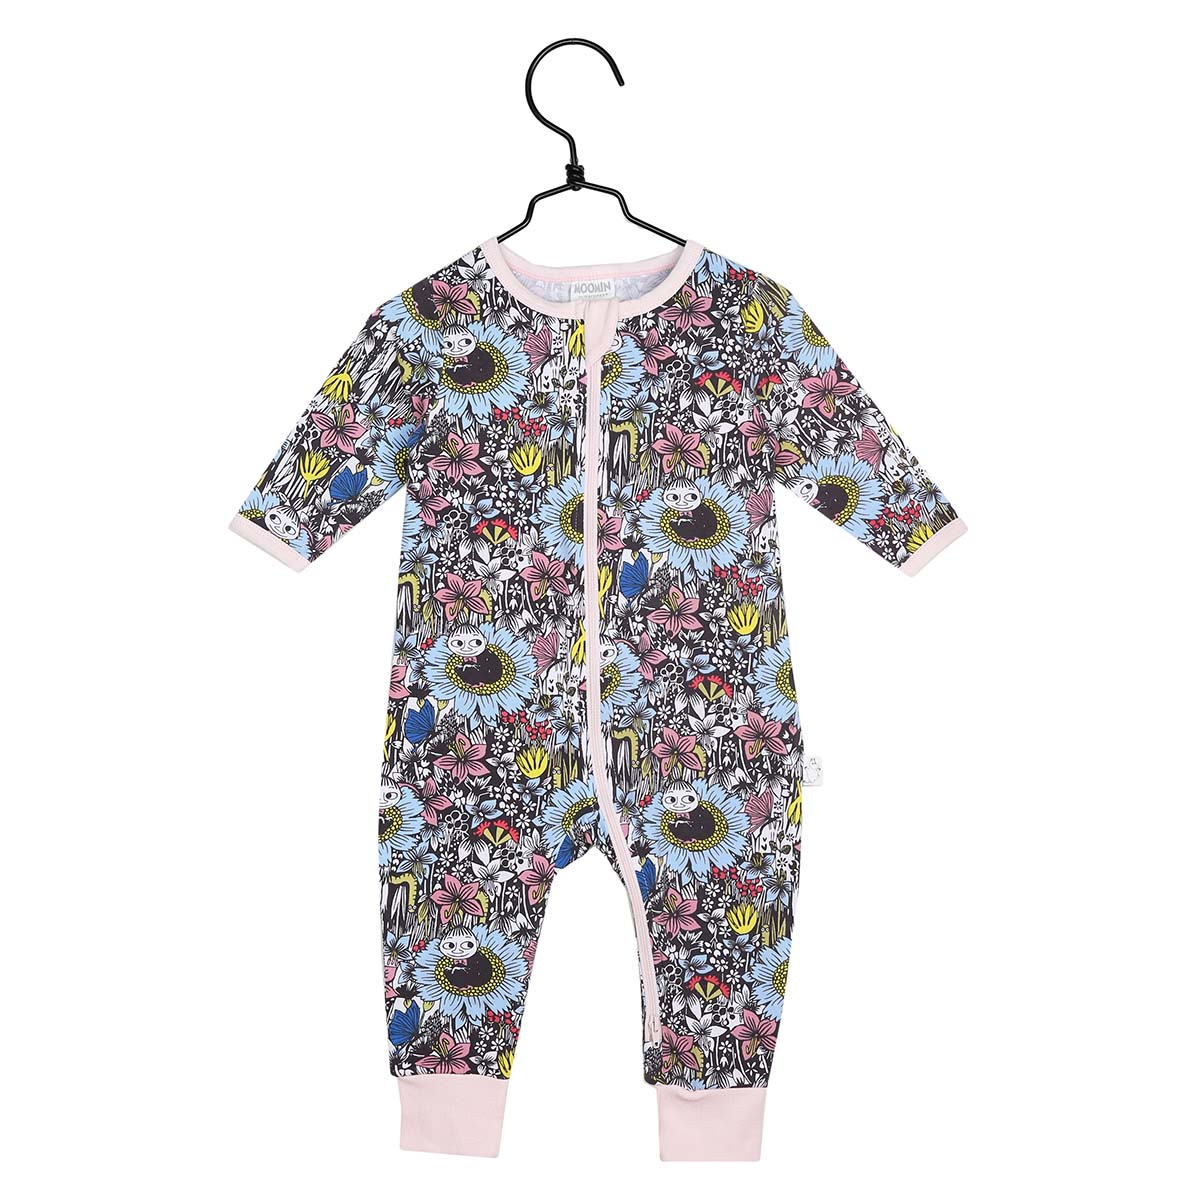 Moomin Dreaming Little My Pyjamas, New